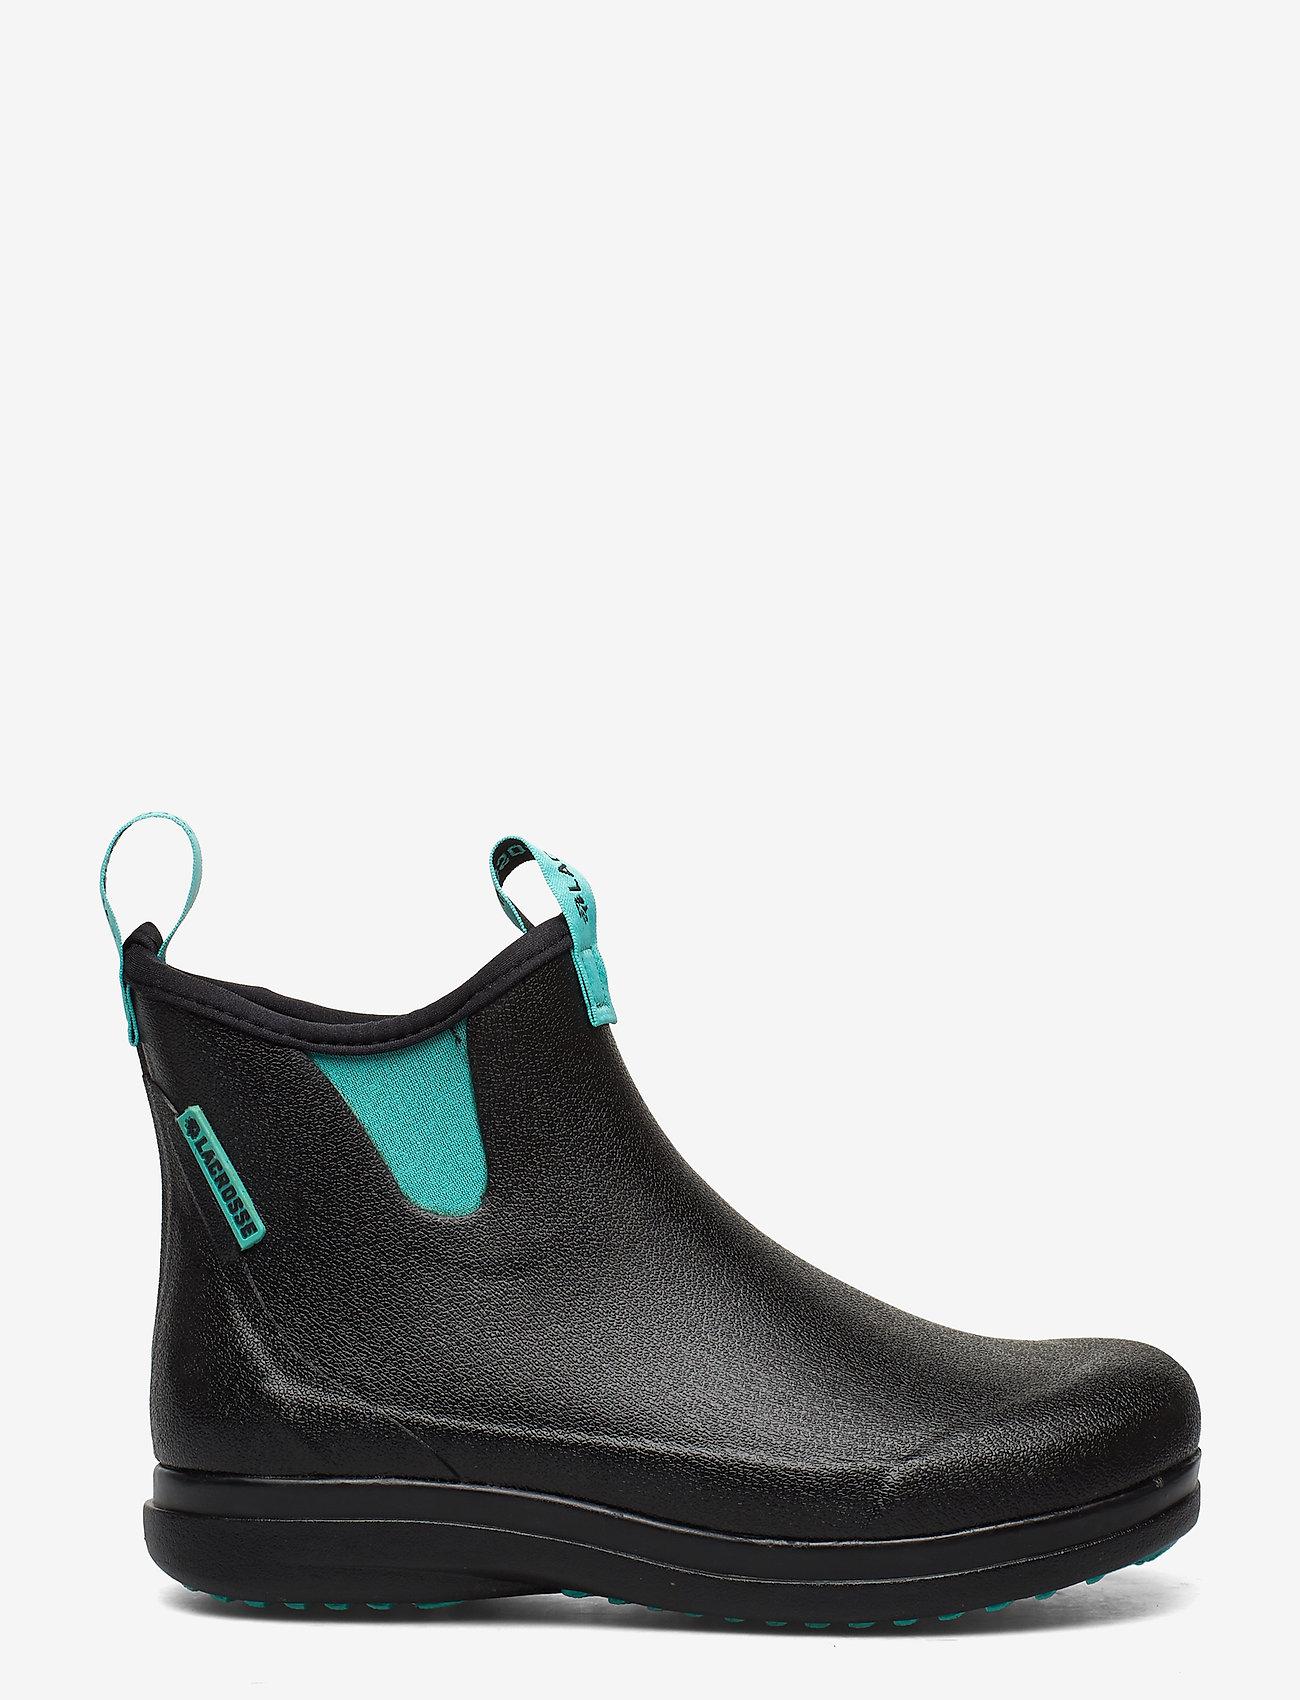 "LaCrosse - Hampton II Women's 6"" - bottes de pluie - black/turquoise - 1"